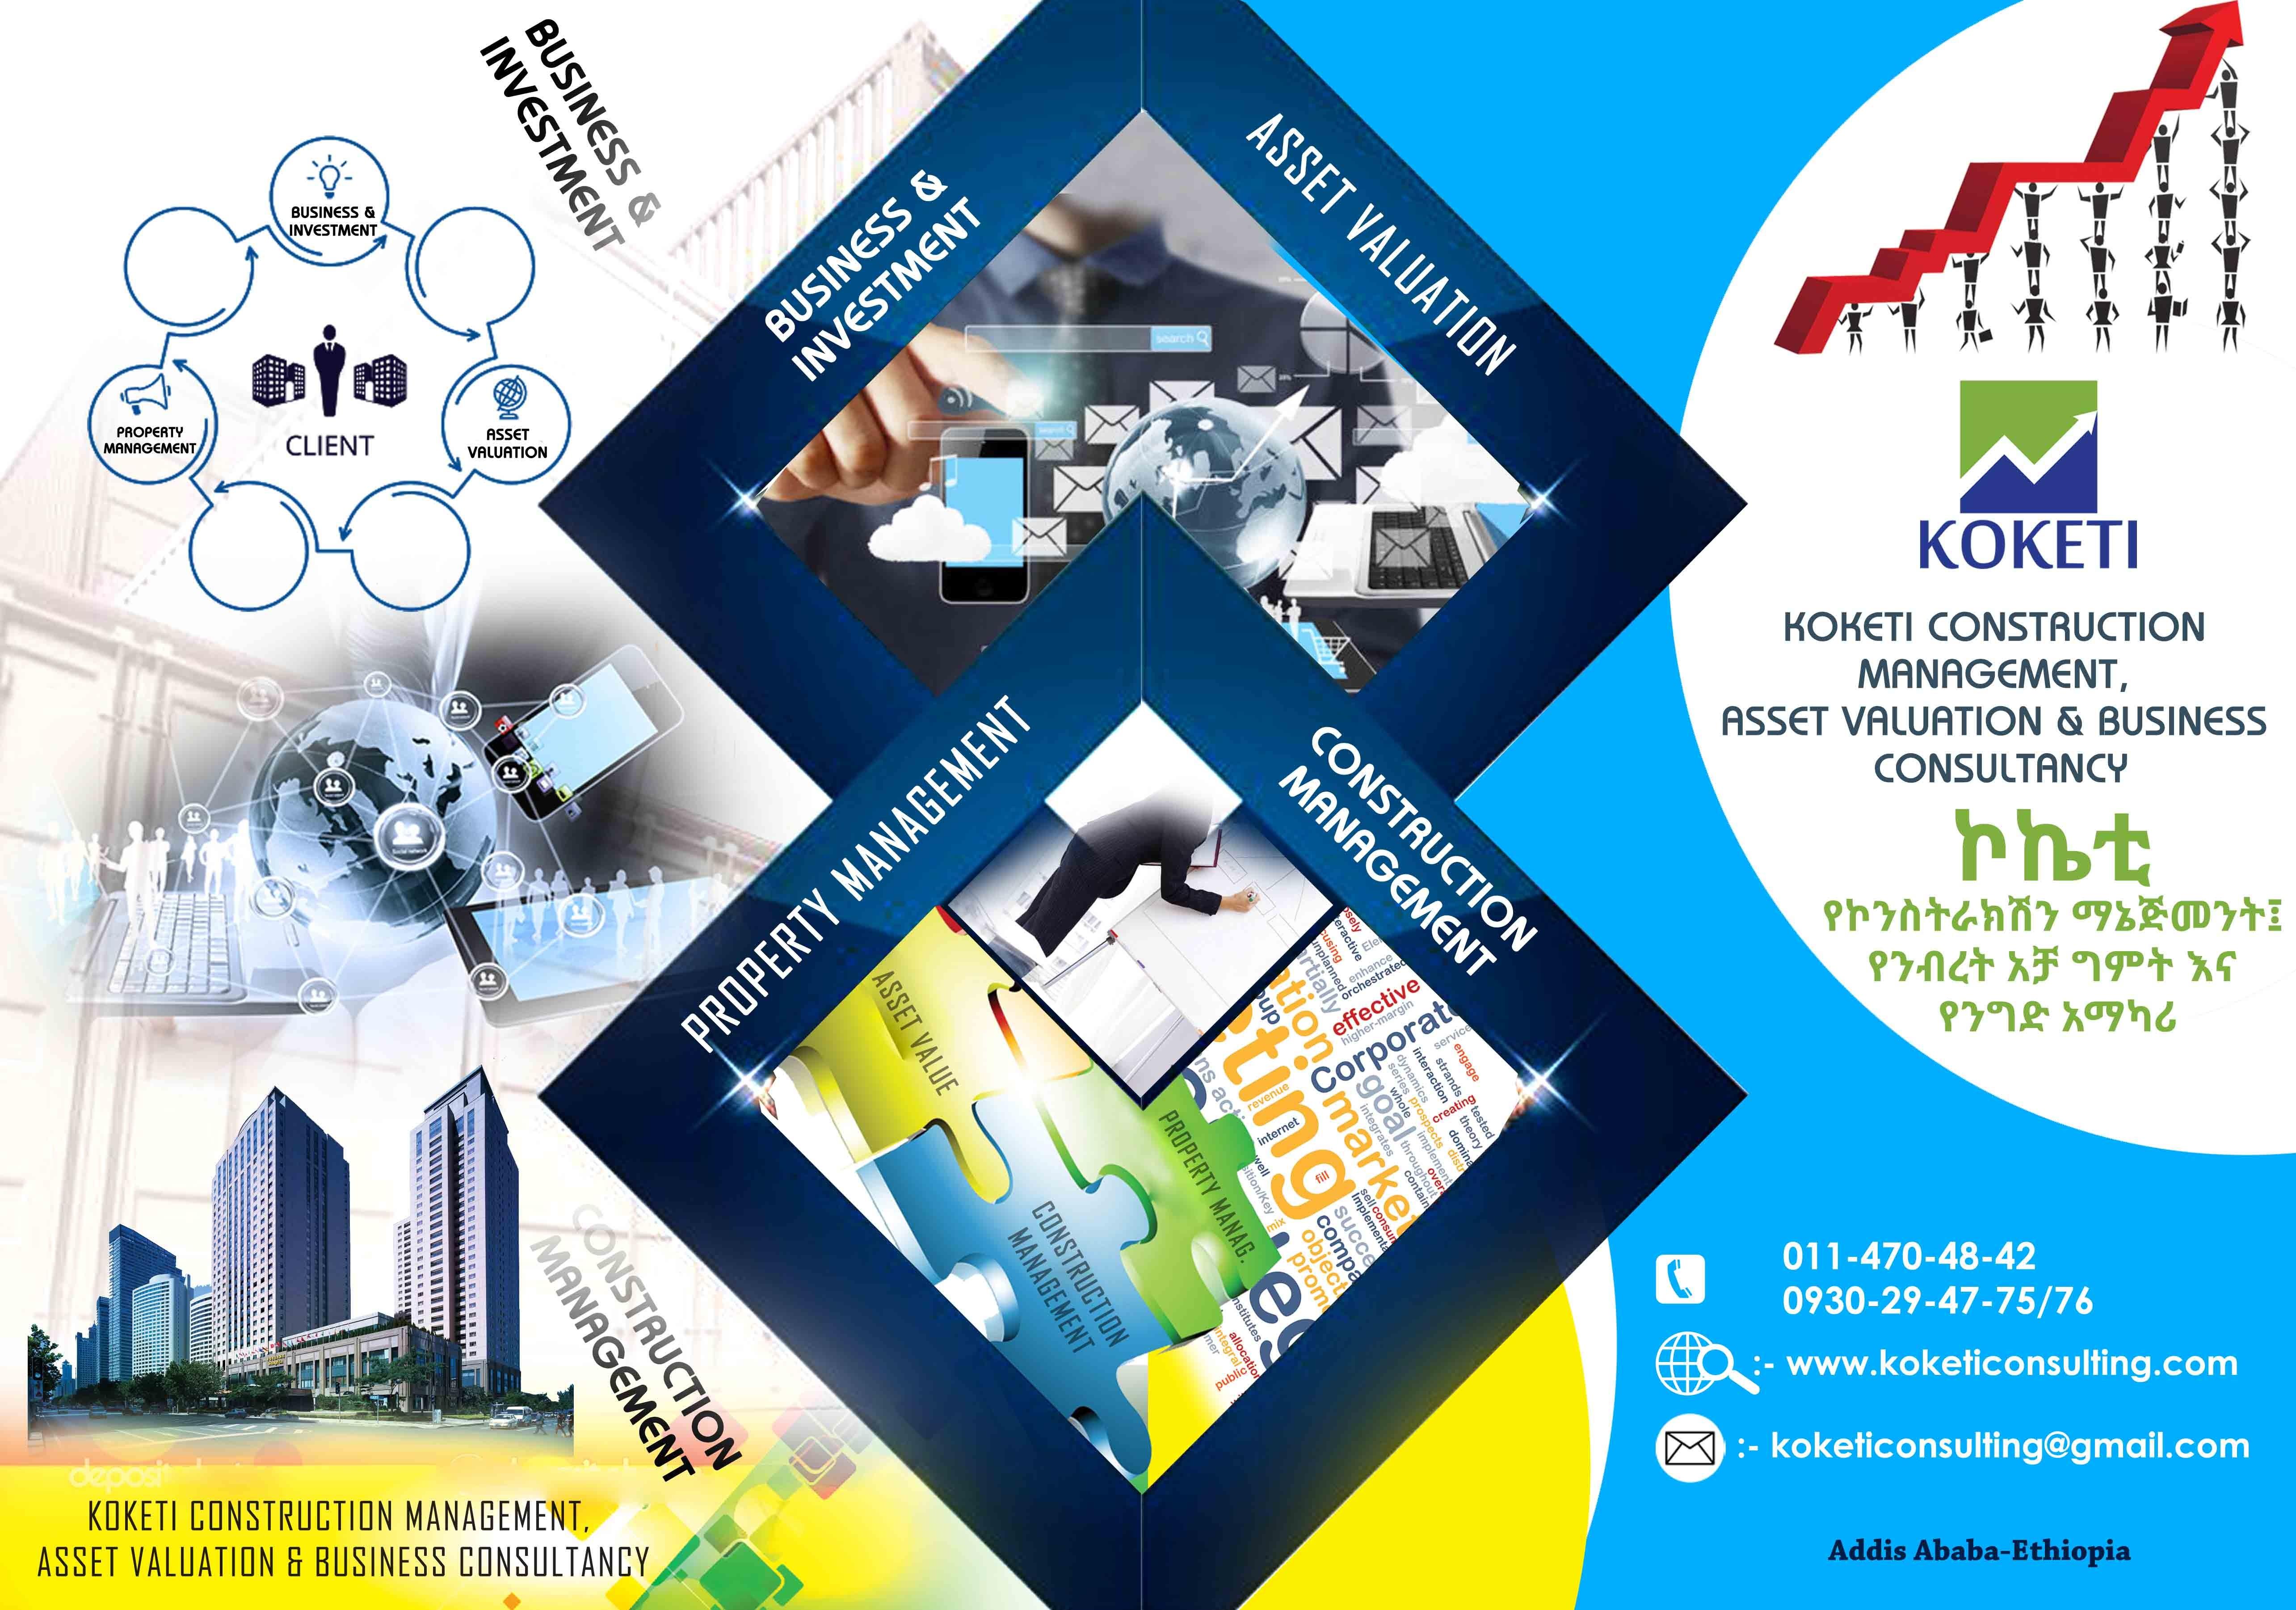 KOKETI Construction Manangement,Asset Valuation & Business